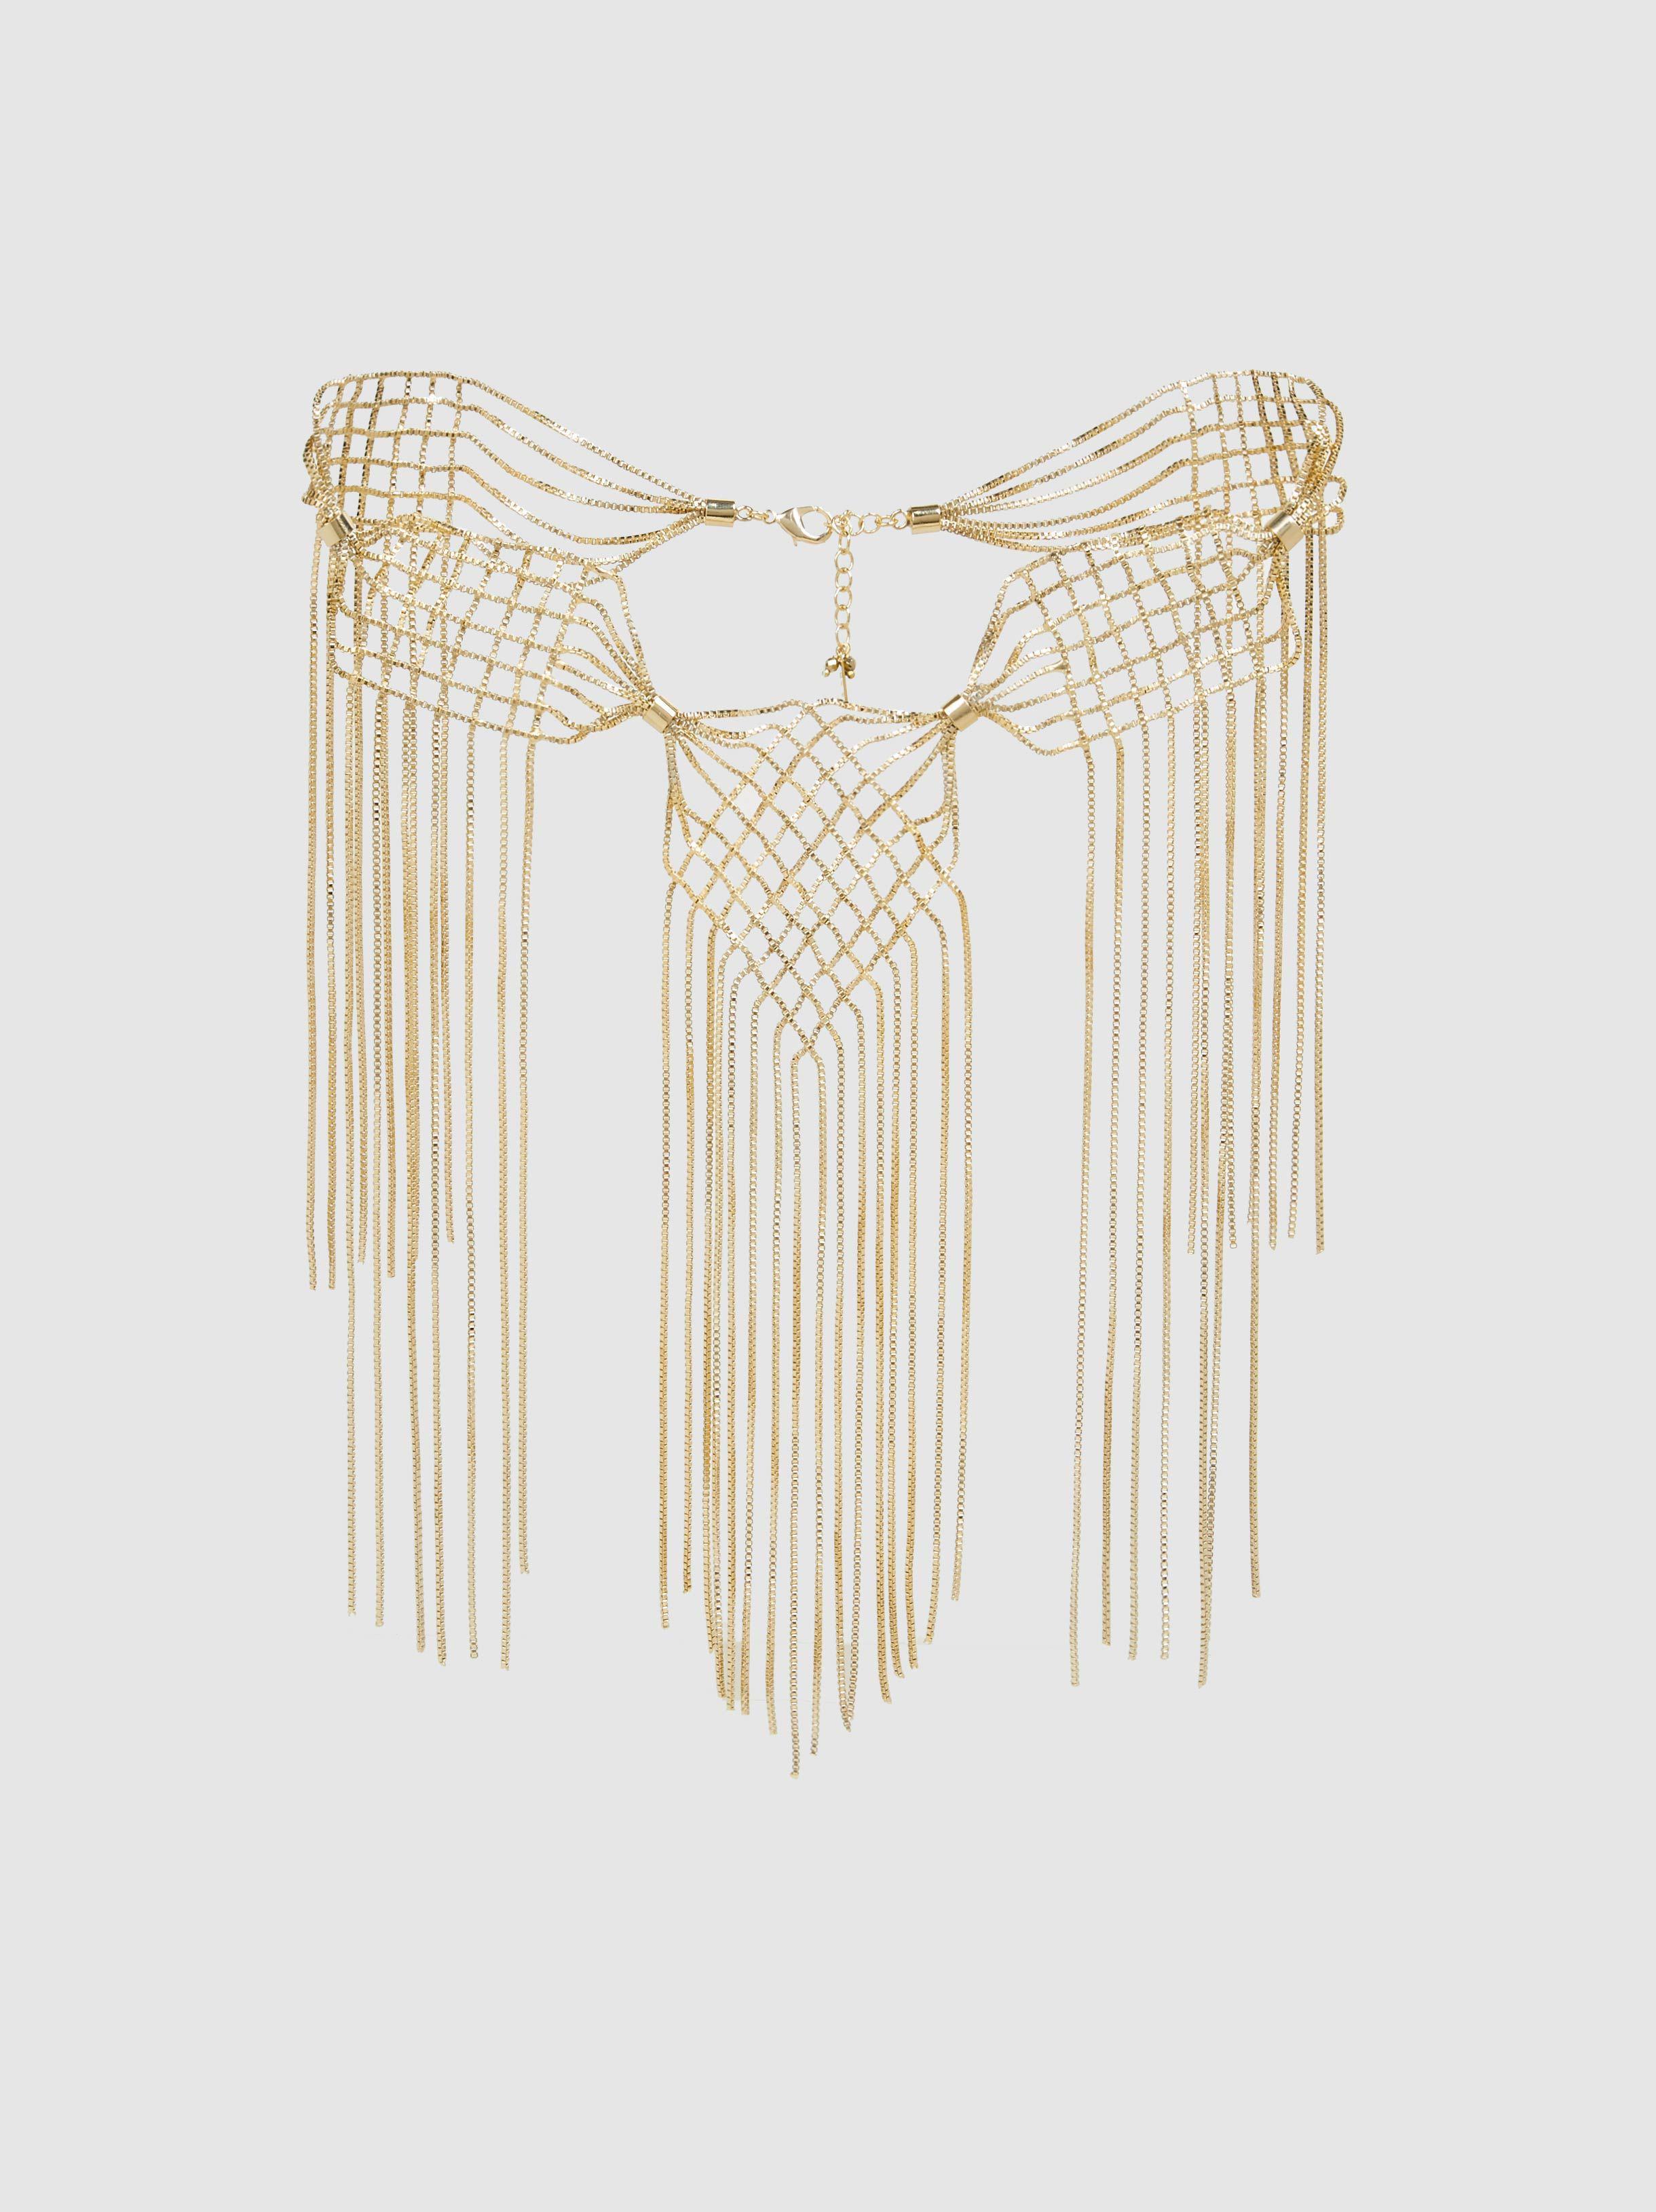 Rosantica Aquilone Fringed Gold-Tone Necklace RLWck3